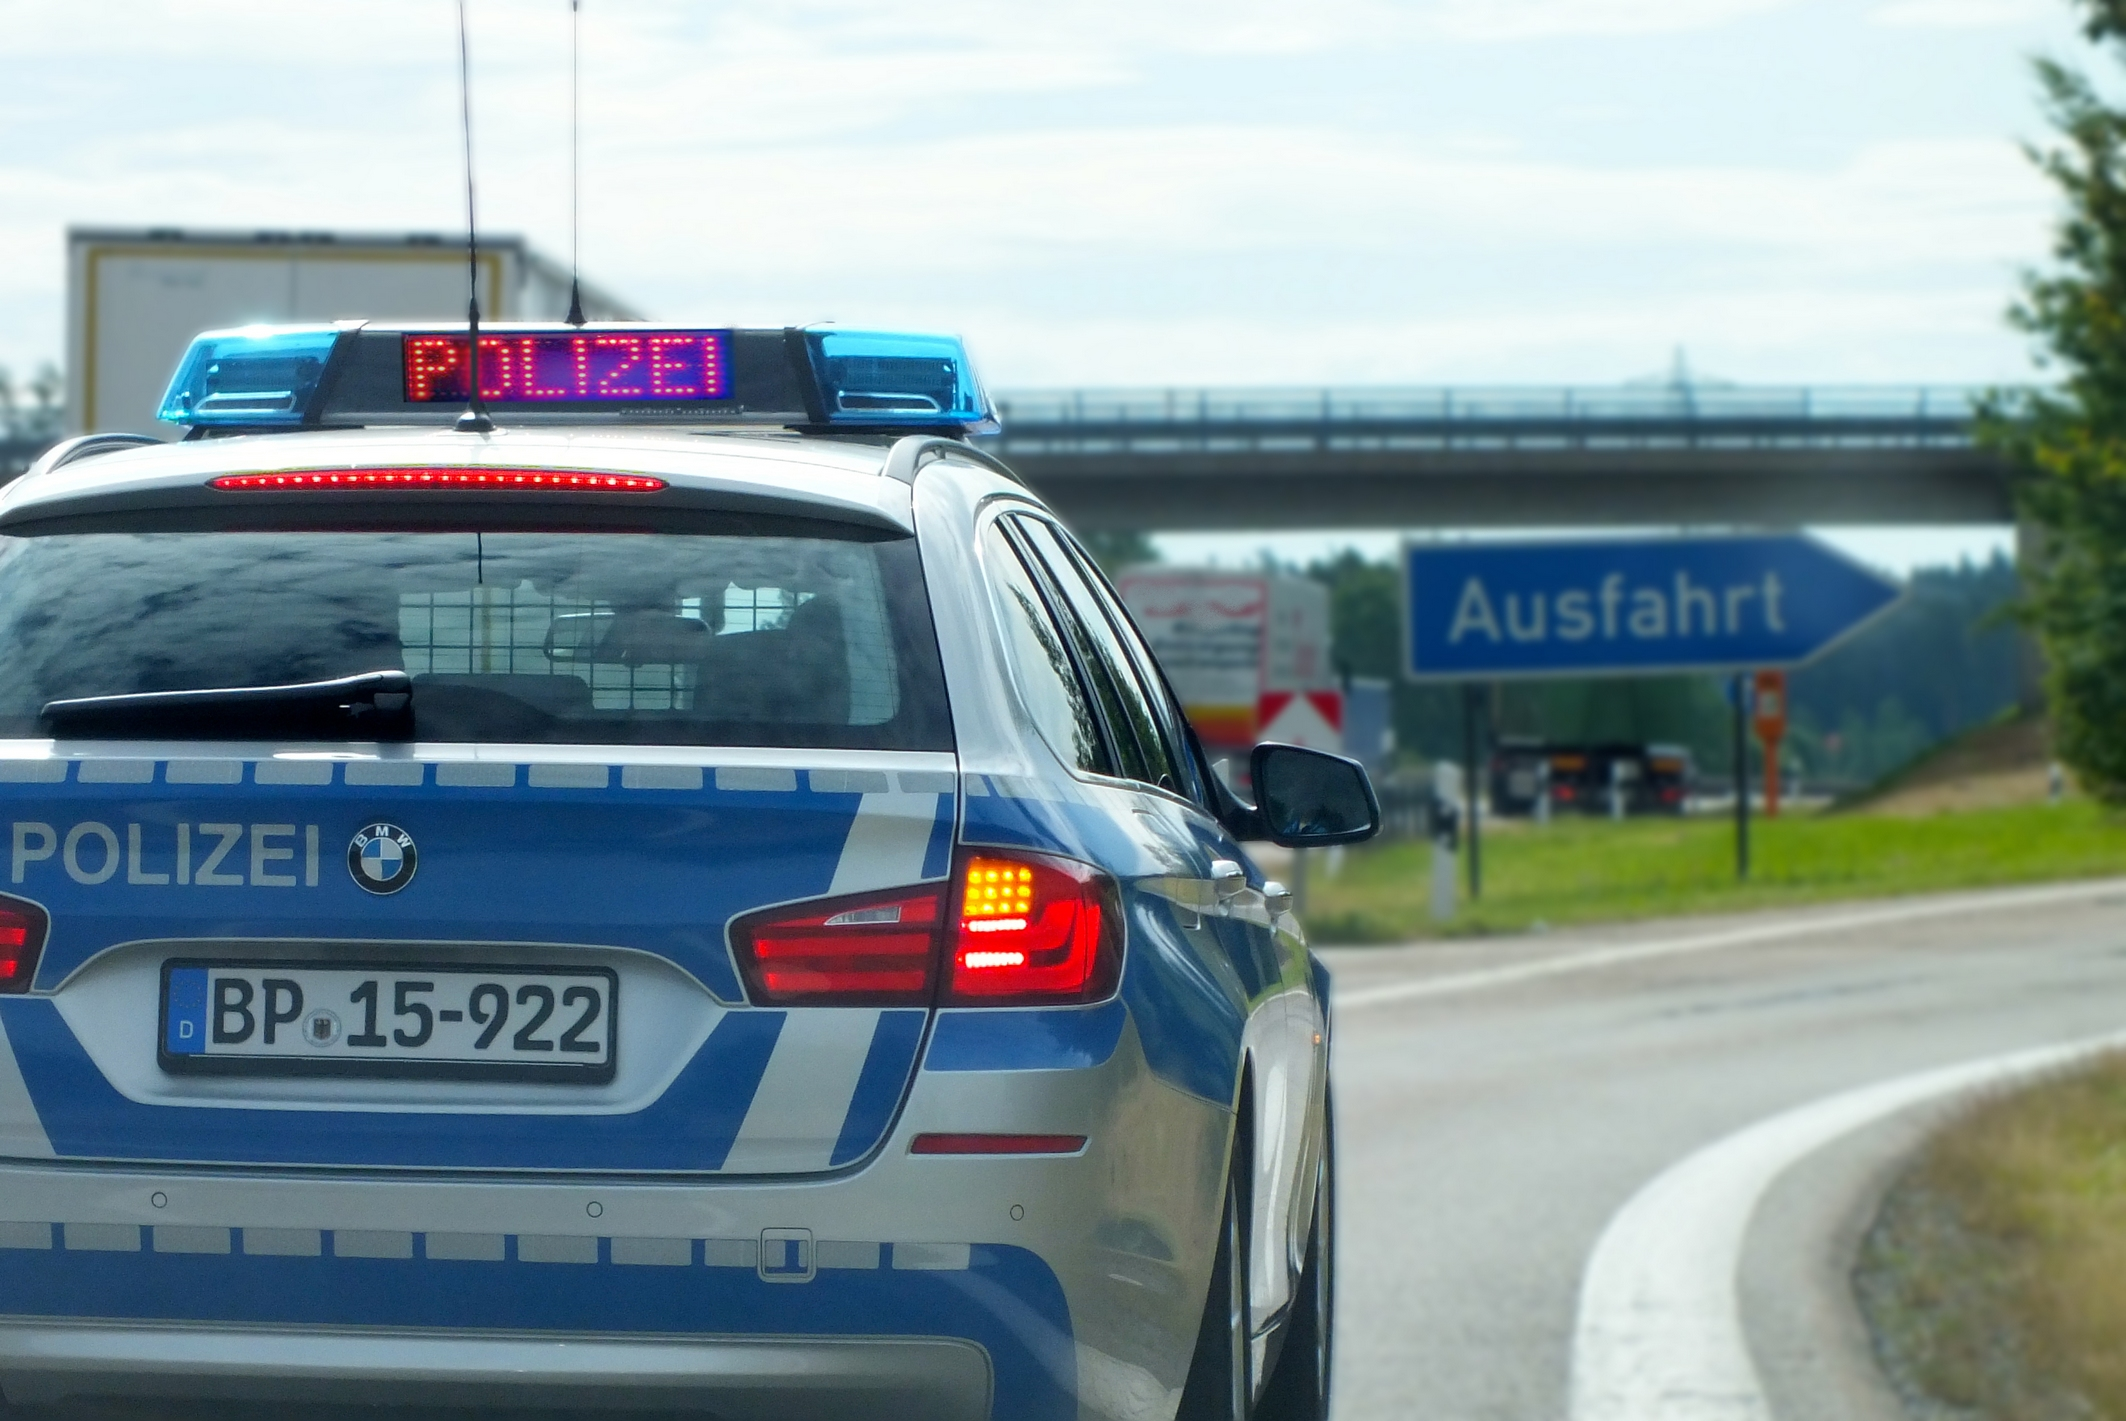 Polizei Ausfahrt